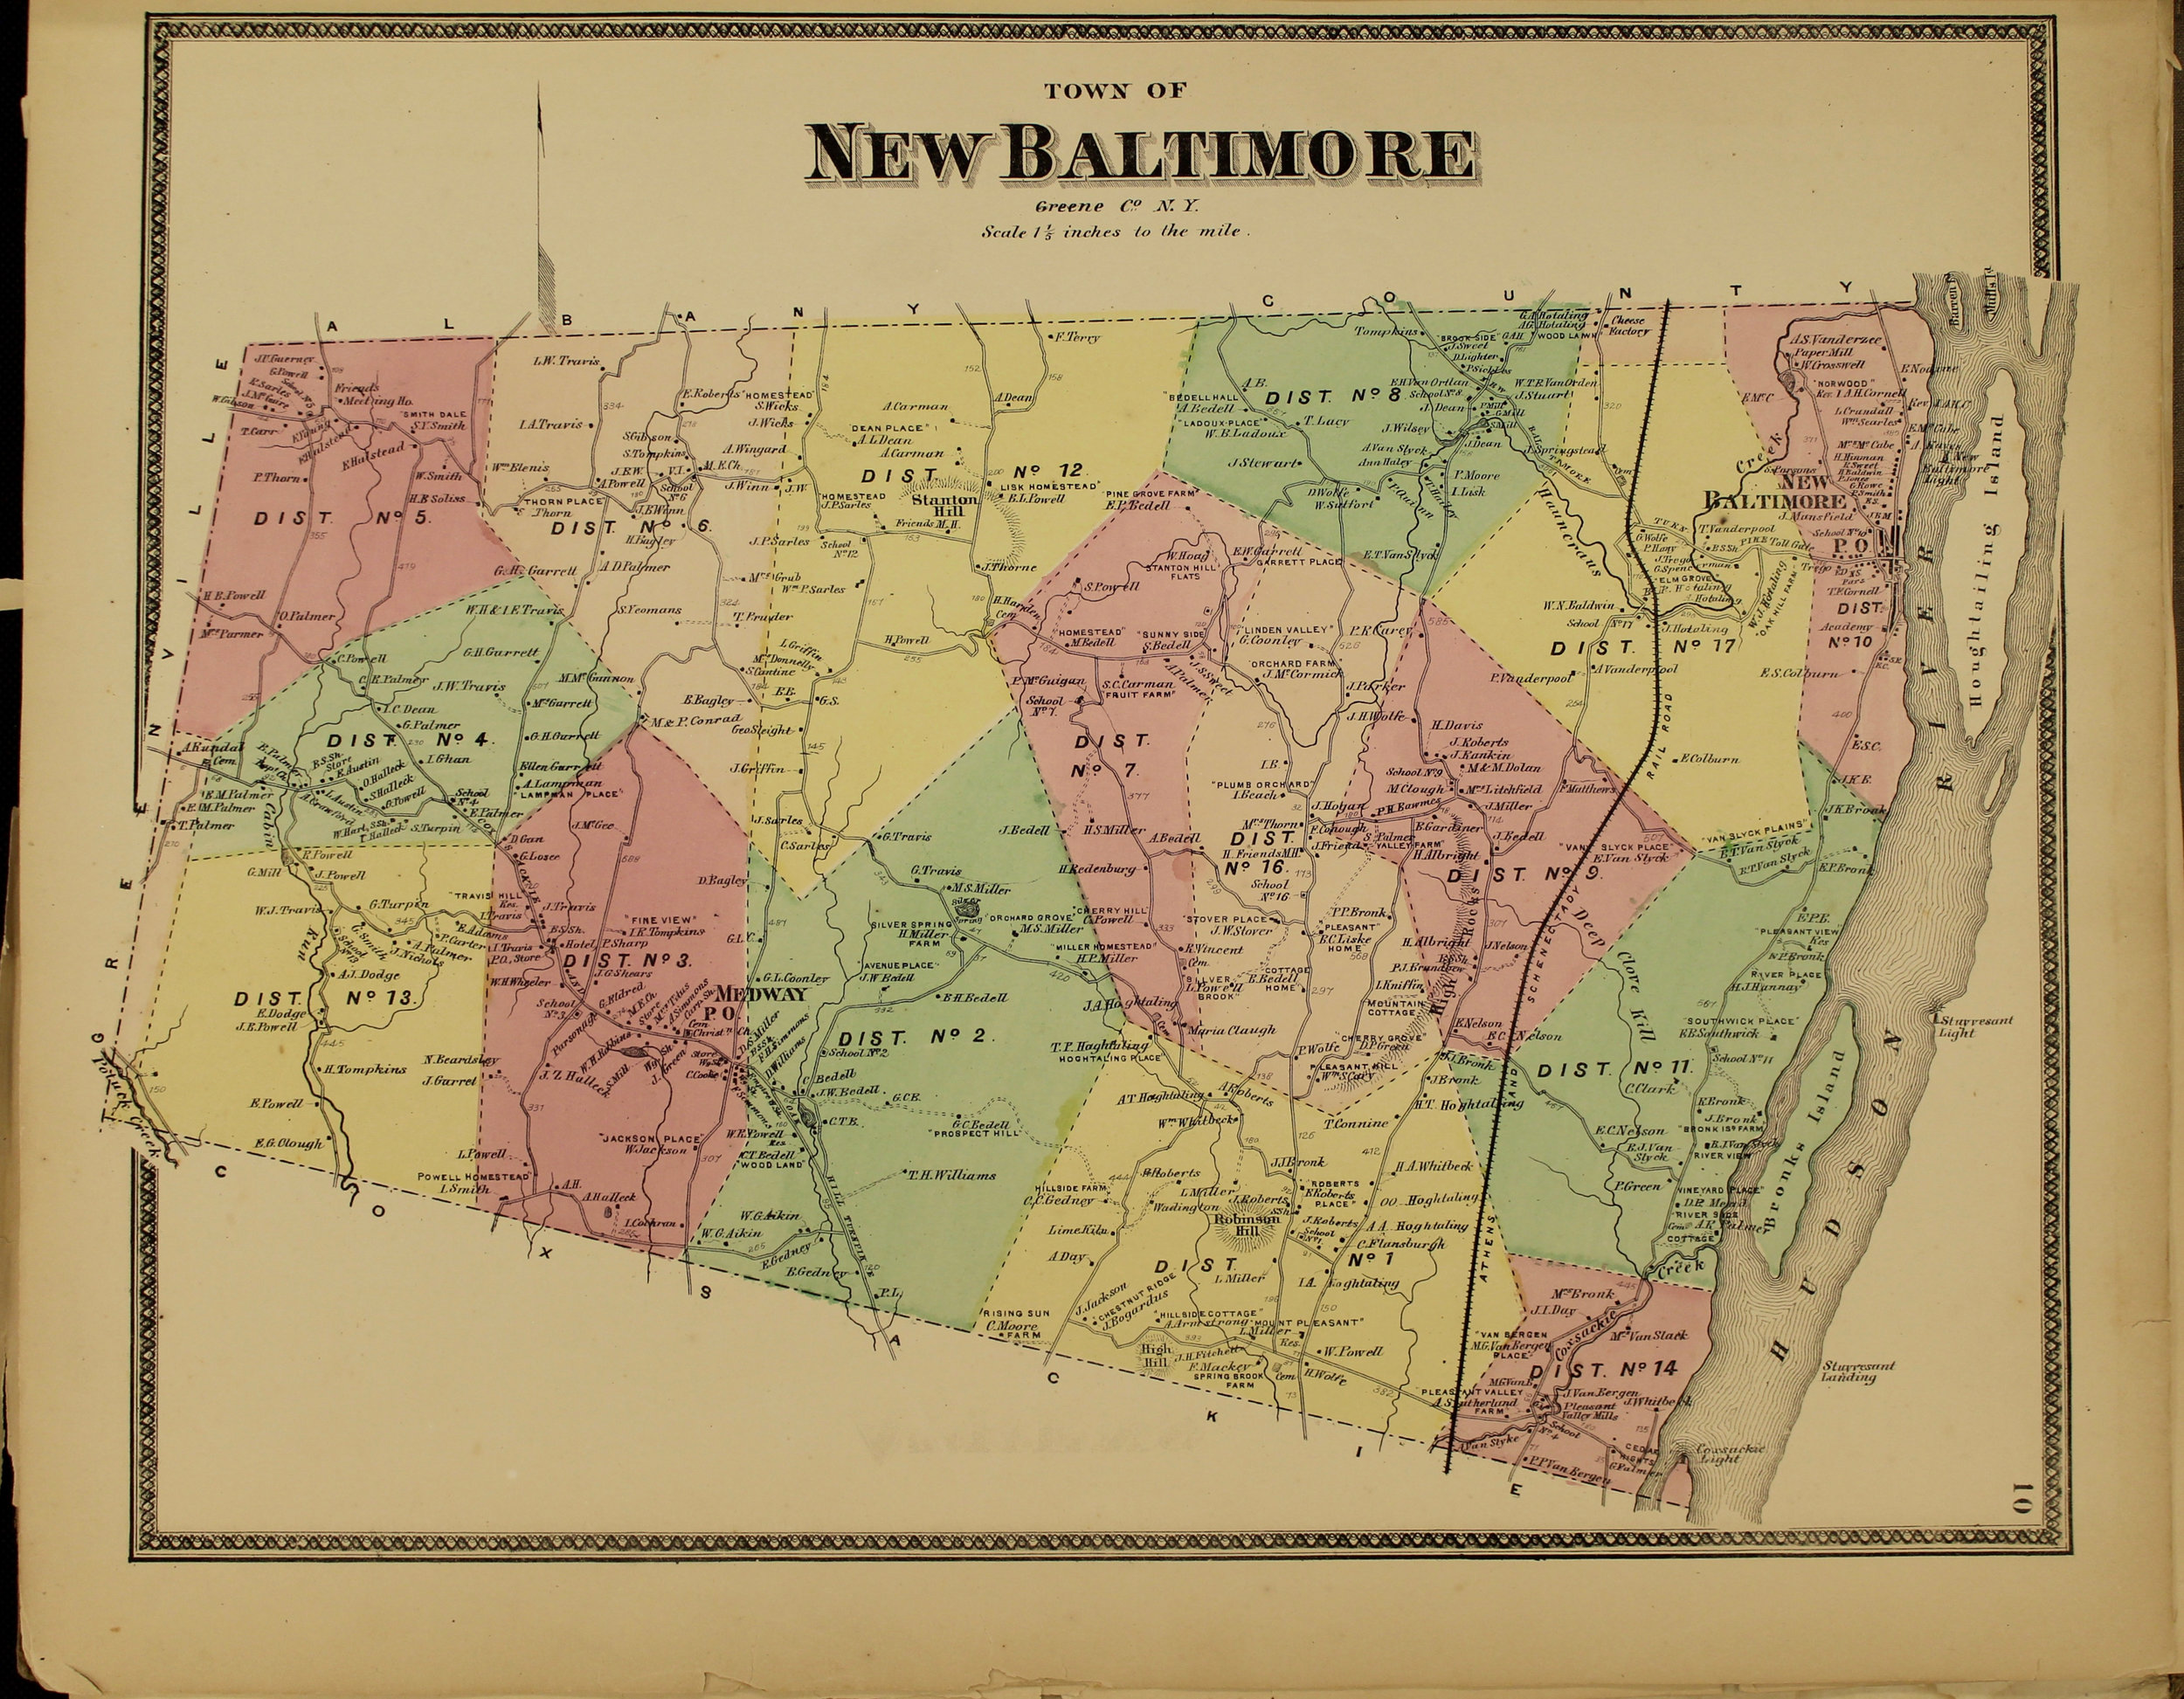 Town of New Baltimore.jpg